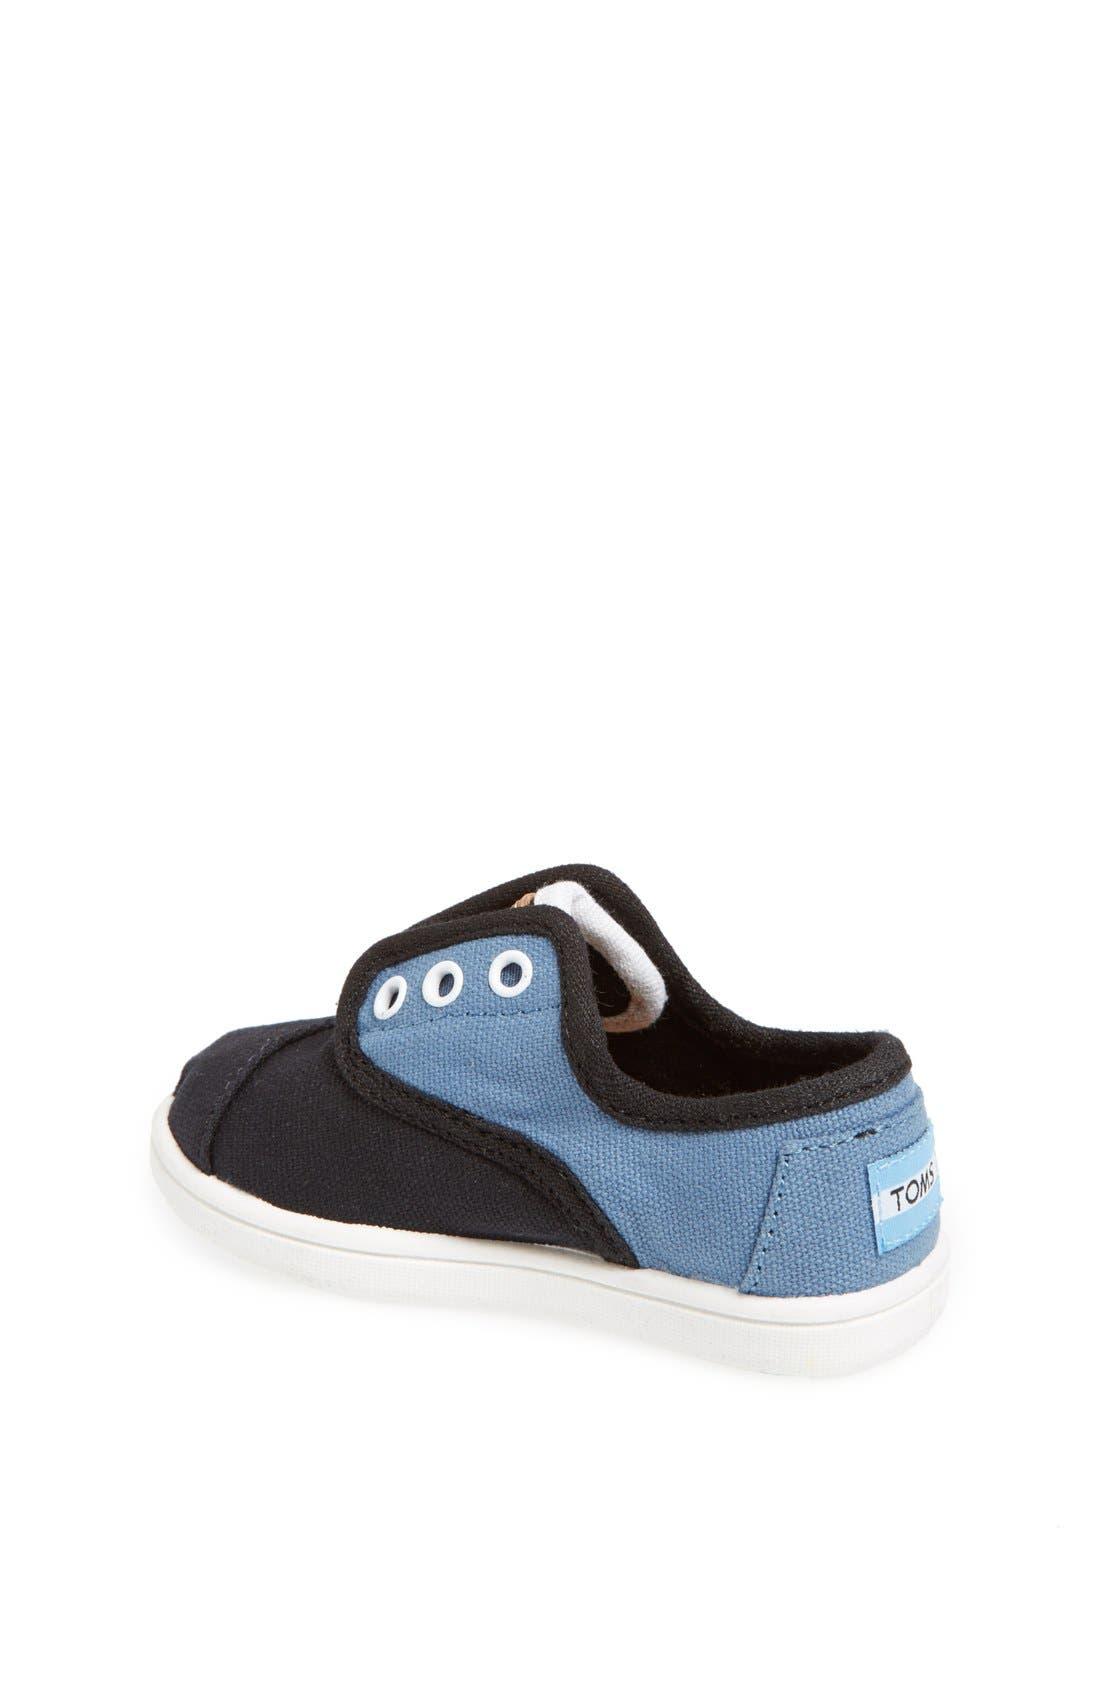 Alternate Image 2  - TOMS 'Cordones - Tiny' Sneaker (Baby, Walker & Toddler)